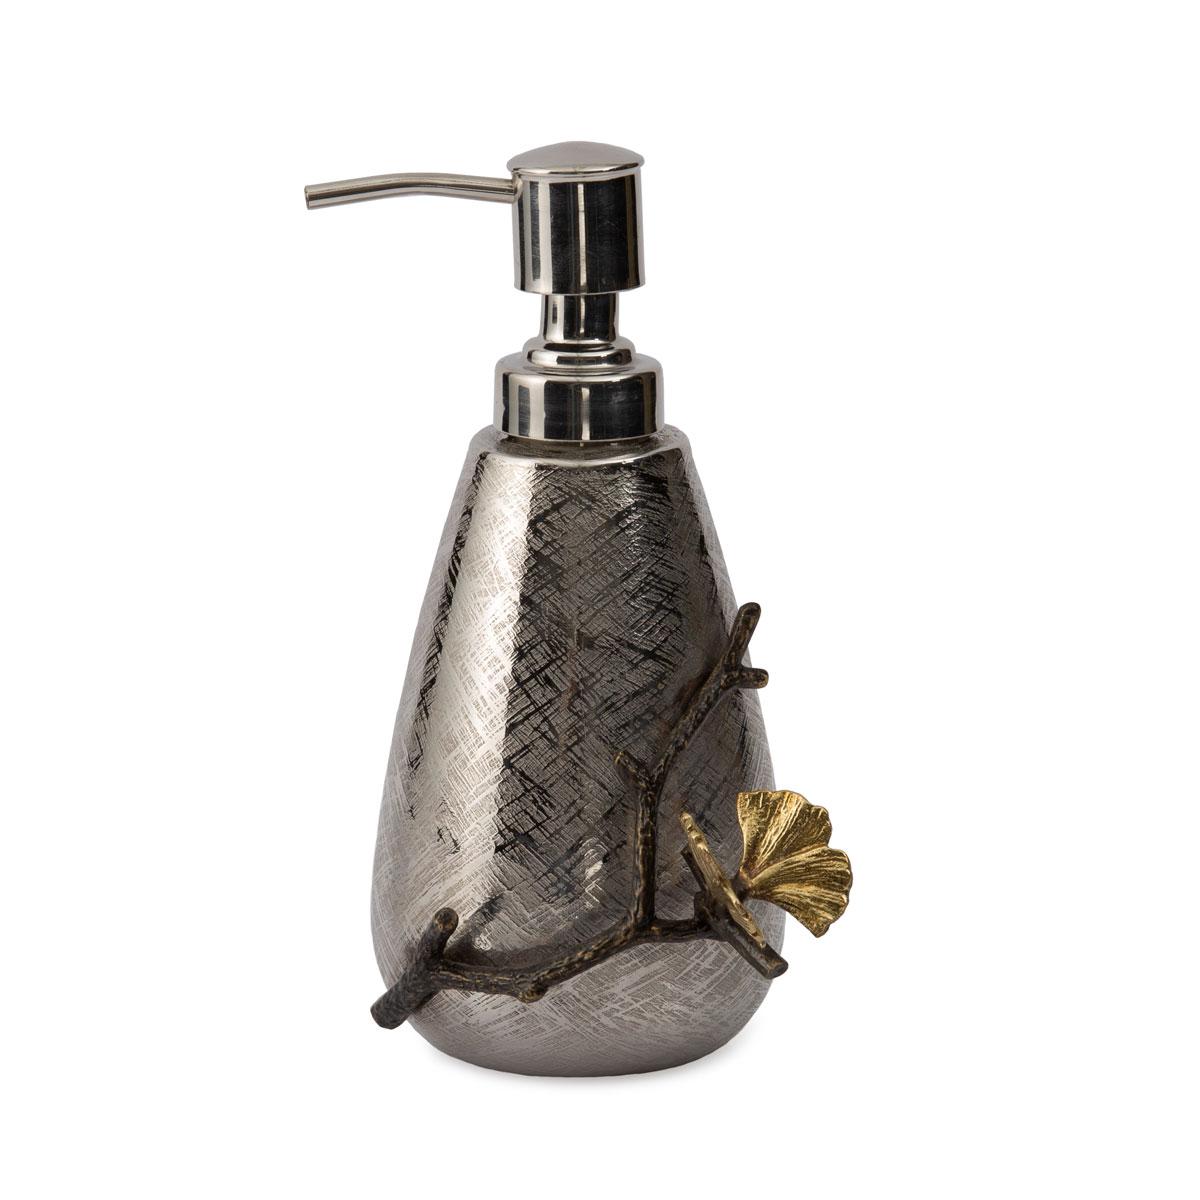 Michael Aram Butterfly Ginkgo Soap Dispenser